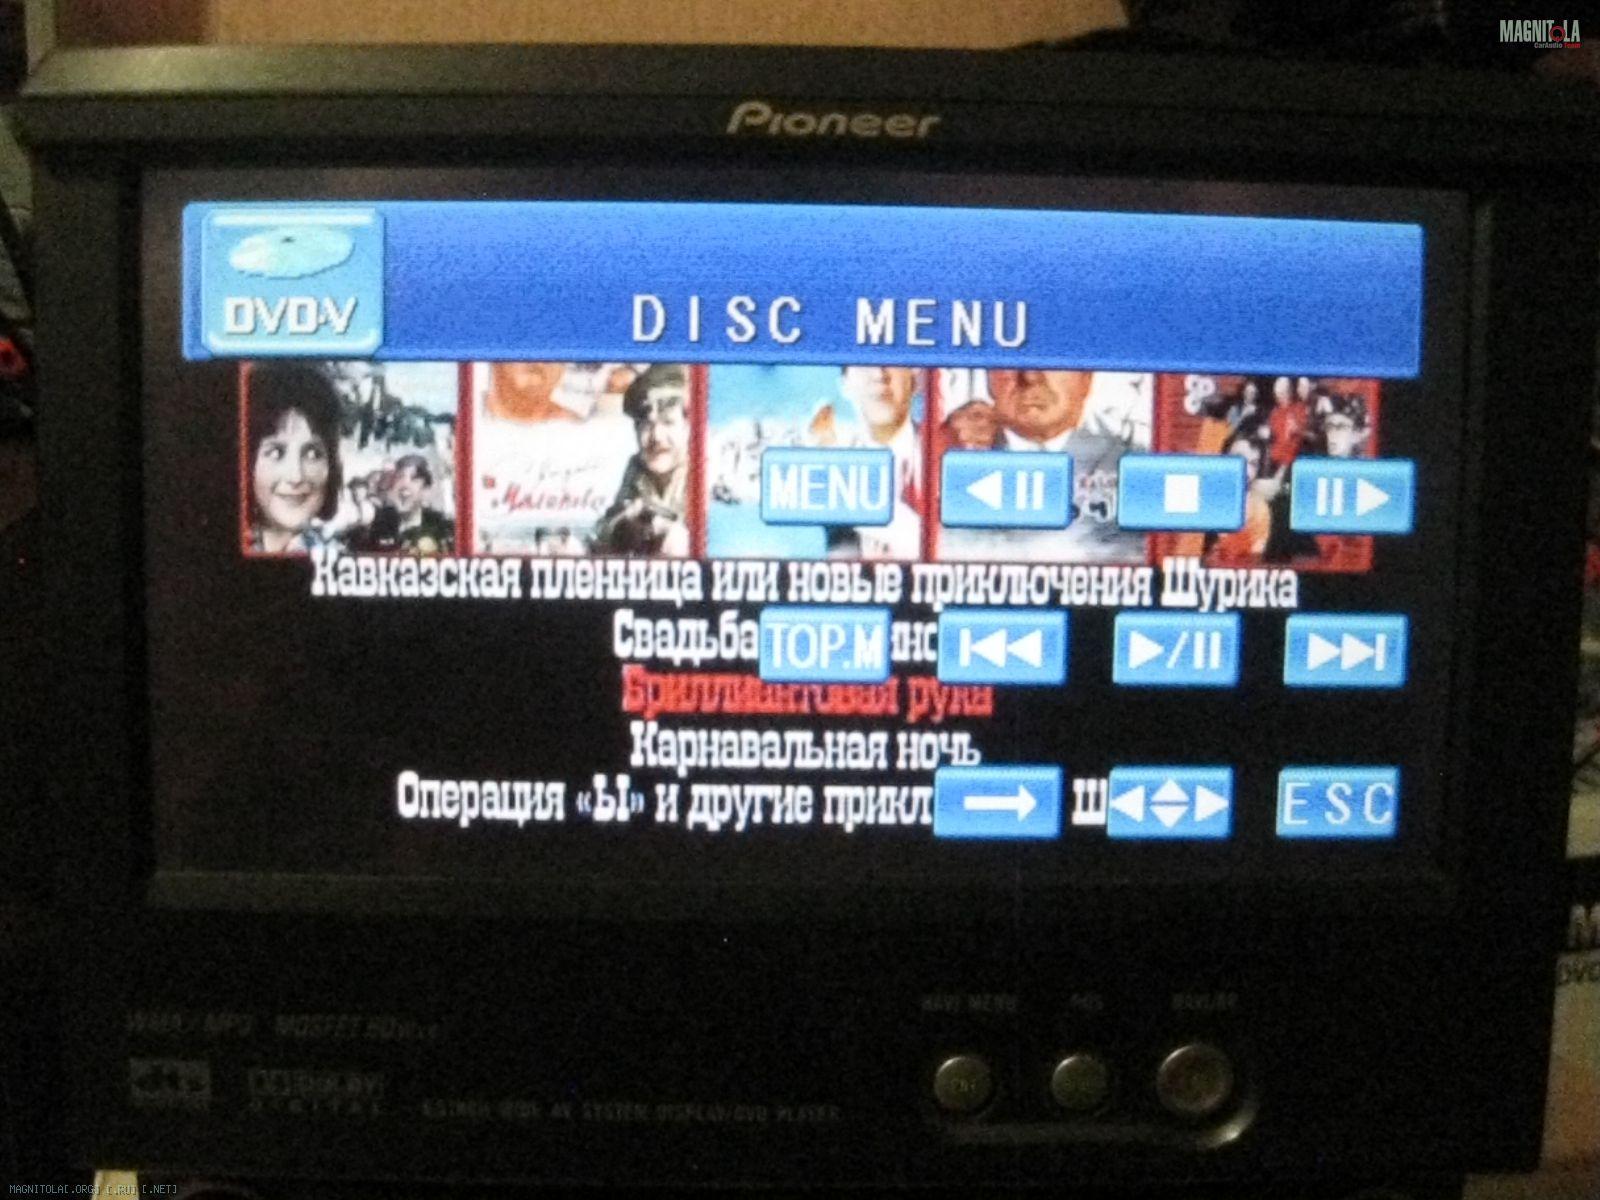 hight resolution of download pioneer avhxl5750bt manuals and read pioneer avh that you avh p5700dvd printed in online dvd rds av receiver avh x8750bt receiver